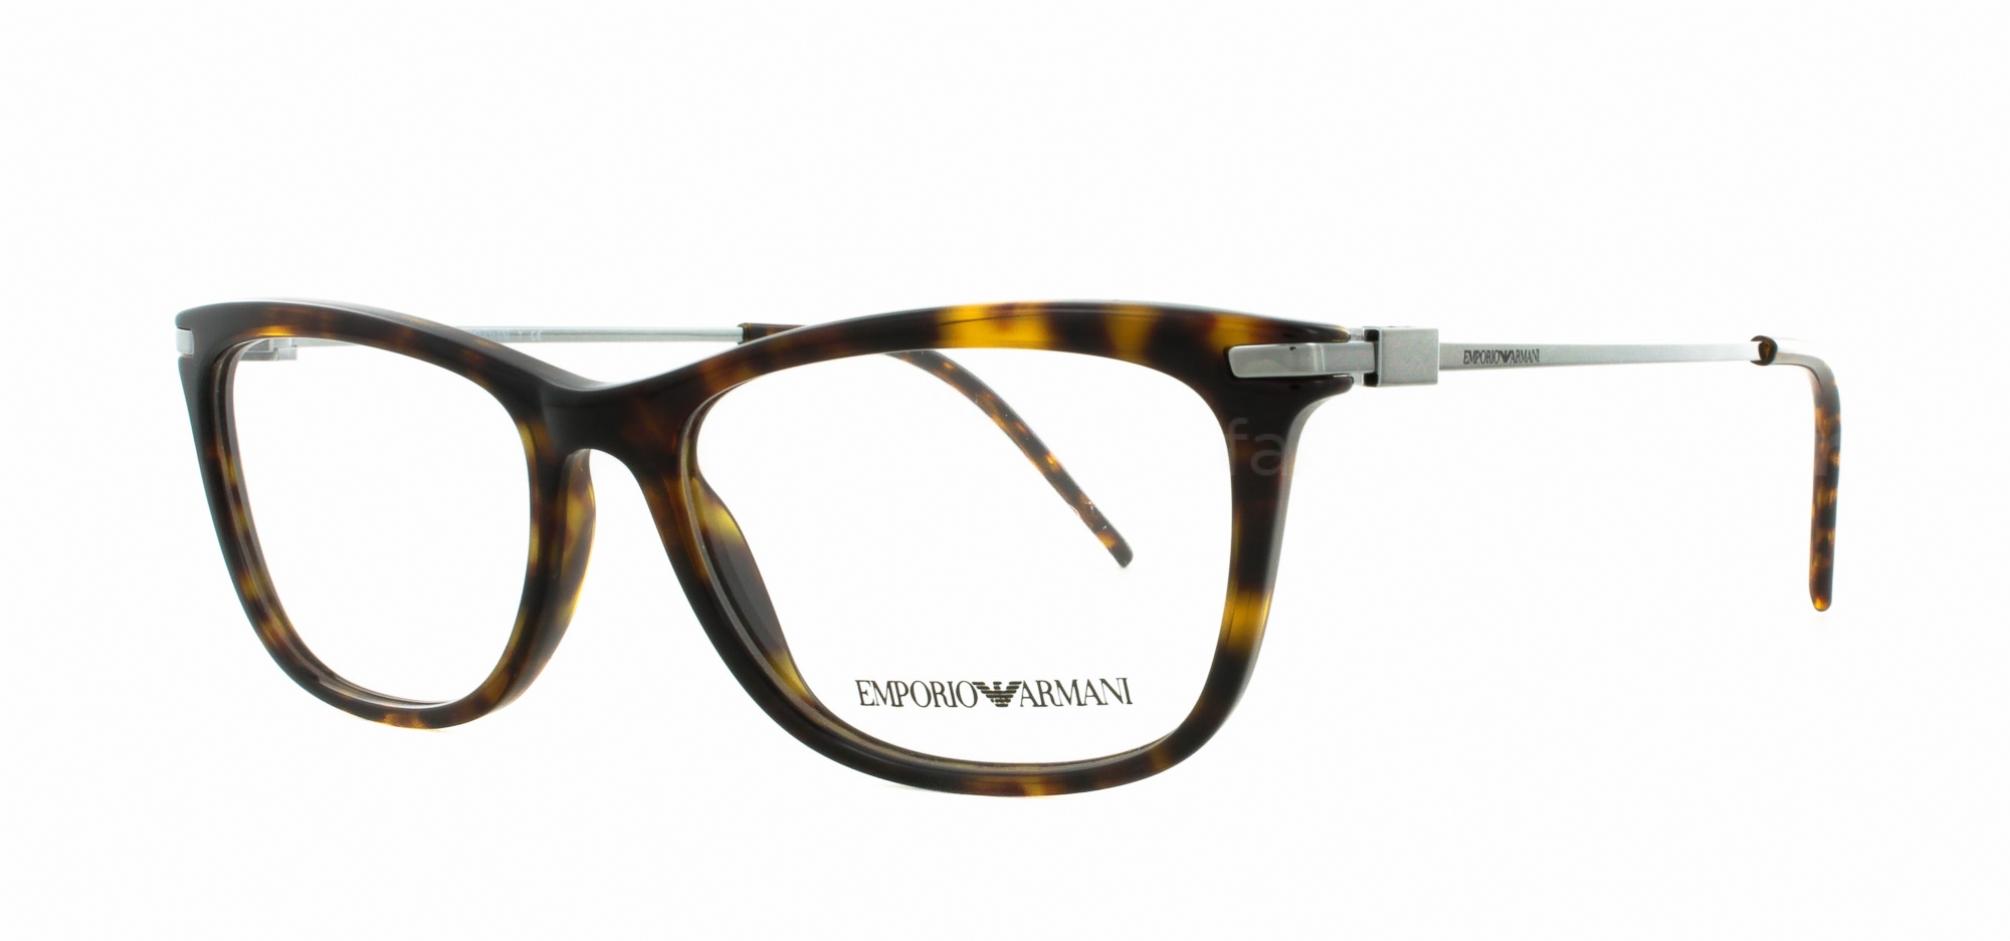 d083660ca102 Emporio Armani 3062 Eyeglasses Emporio Armani EMPORIO ARMANI EA9655 COL P08  GUNMETAL RIMLESS EYEGLASSES FRAME ...